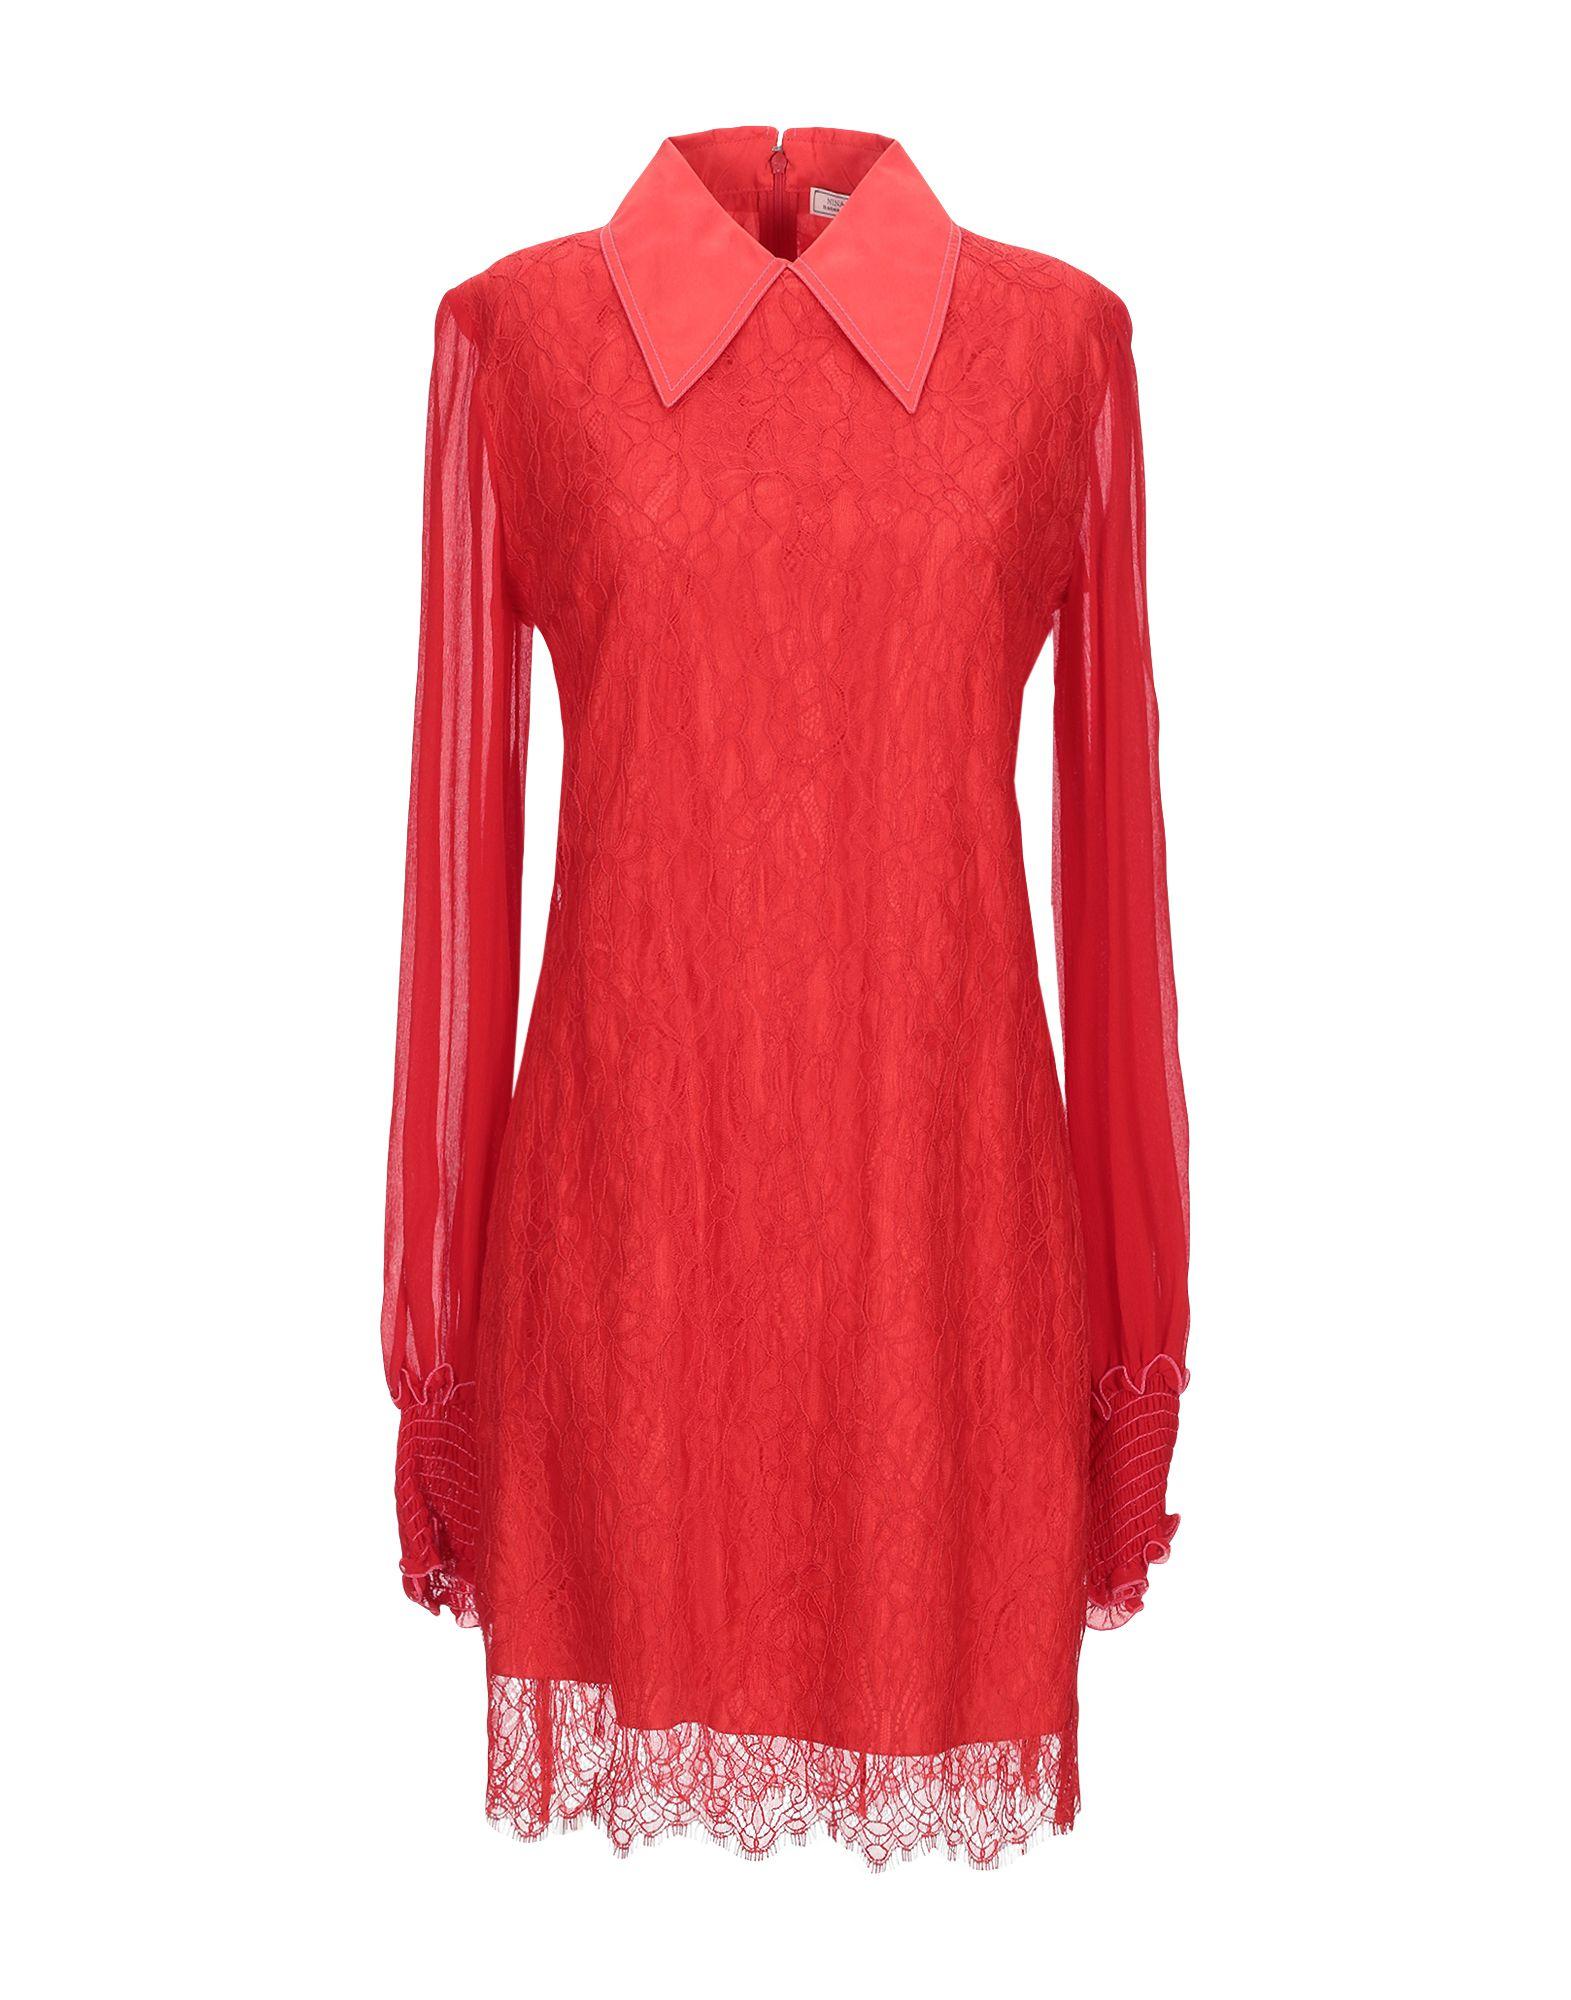 NINA RICCI Короткое платье платье с поясом nina ricci